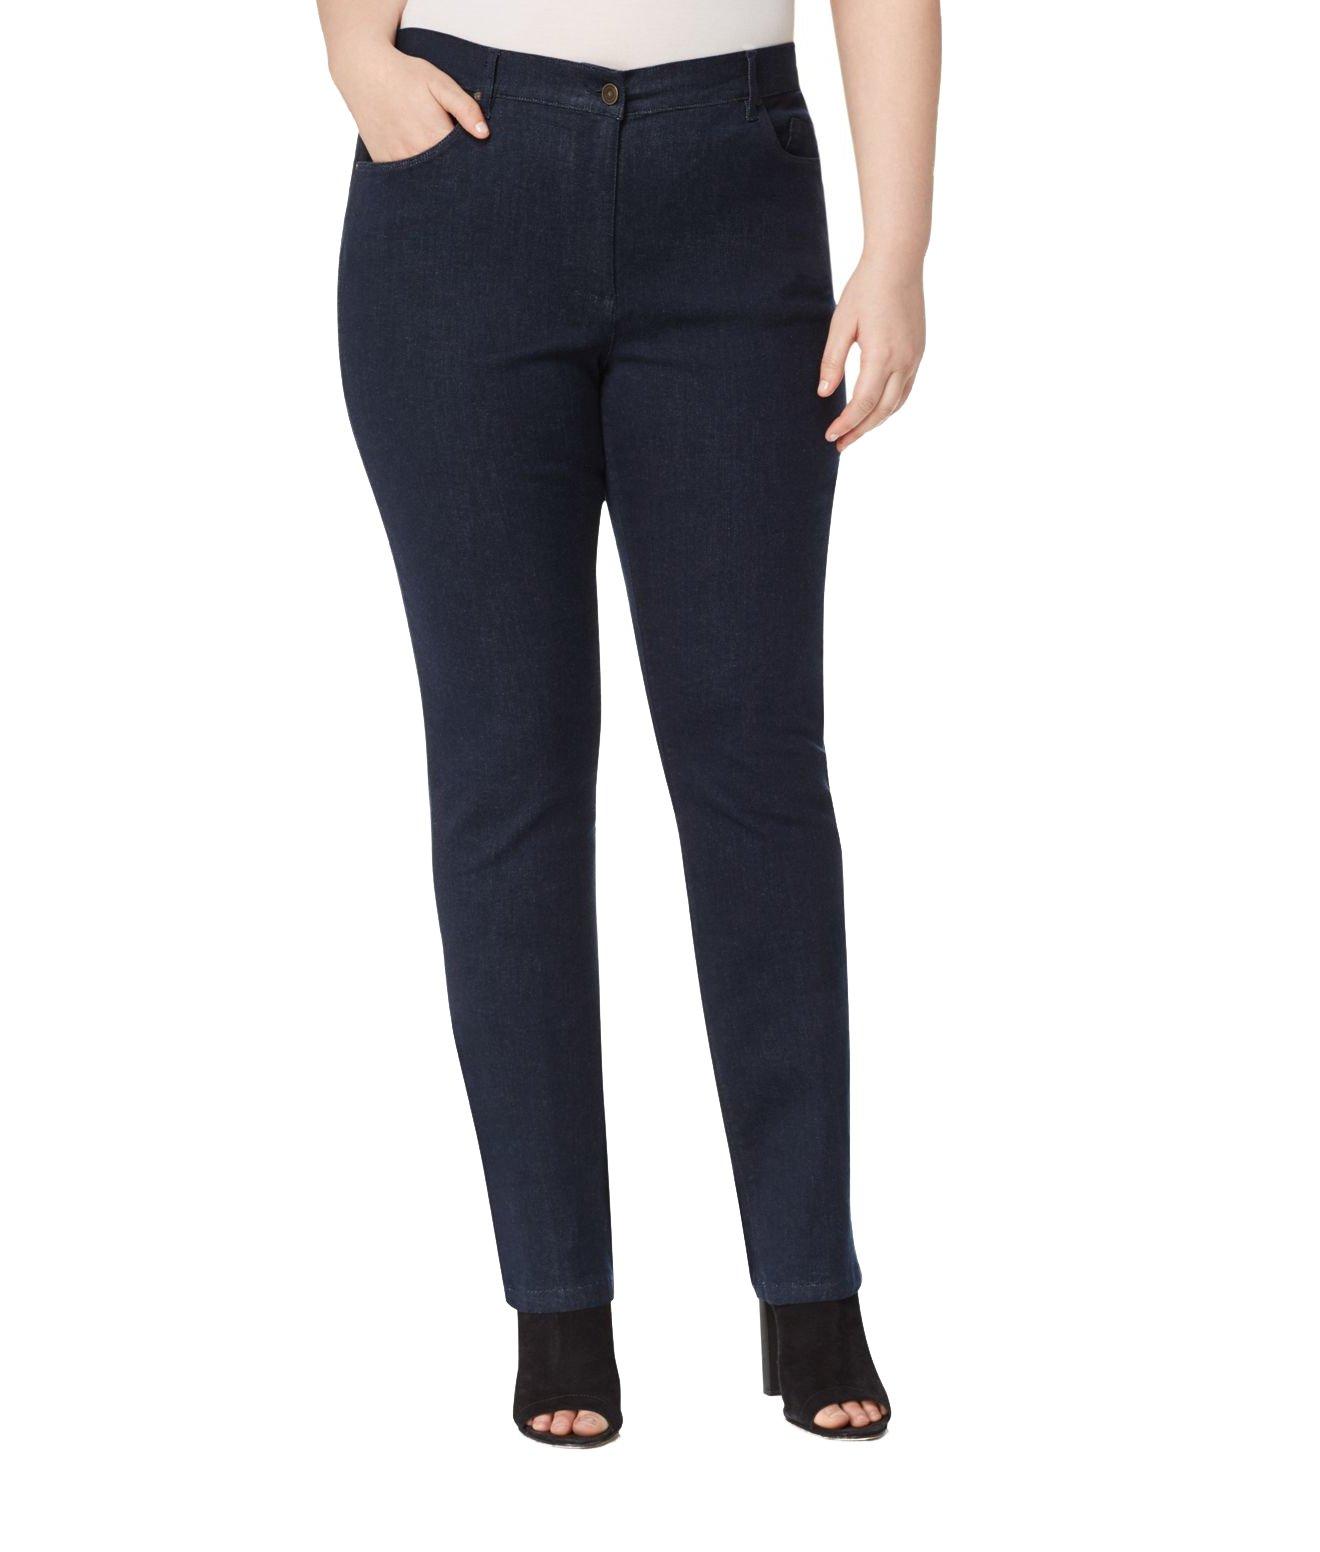 Marina Rinaldi Women's Ilare Original Slim Jeans, Dark Indigo, 24W/33